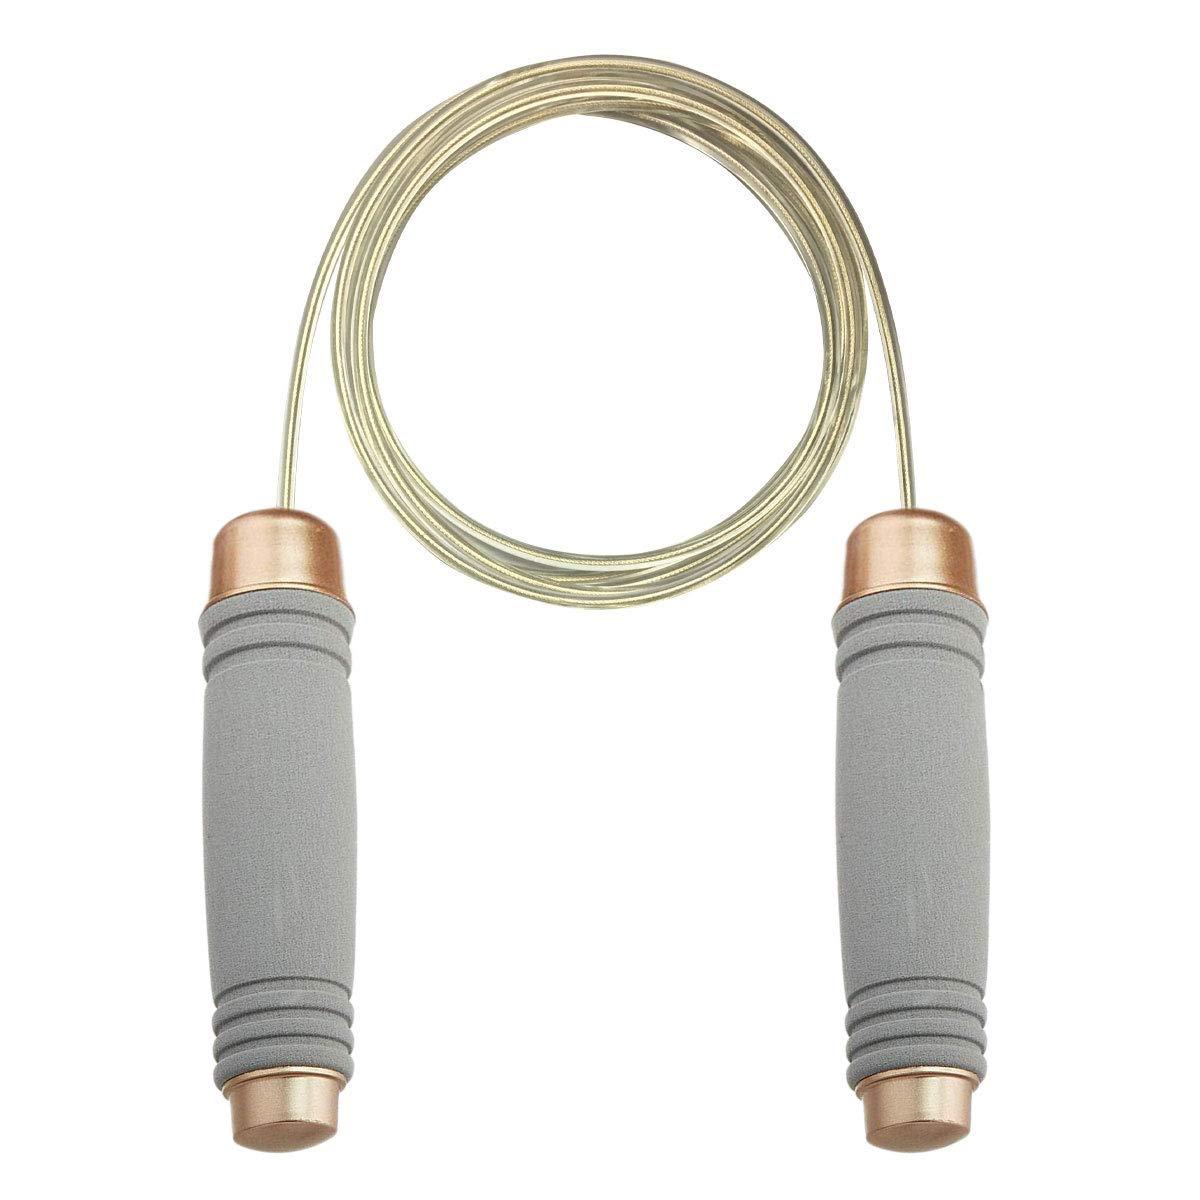 Professional Adjustable Steel Wire Durable Easy to Adjust Premium Jump Rope